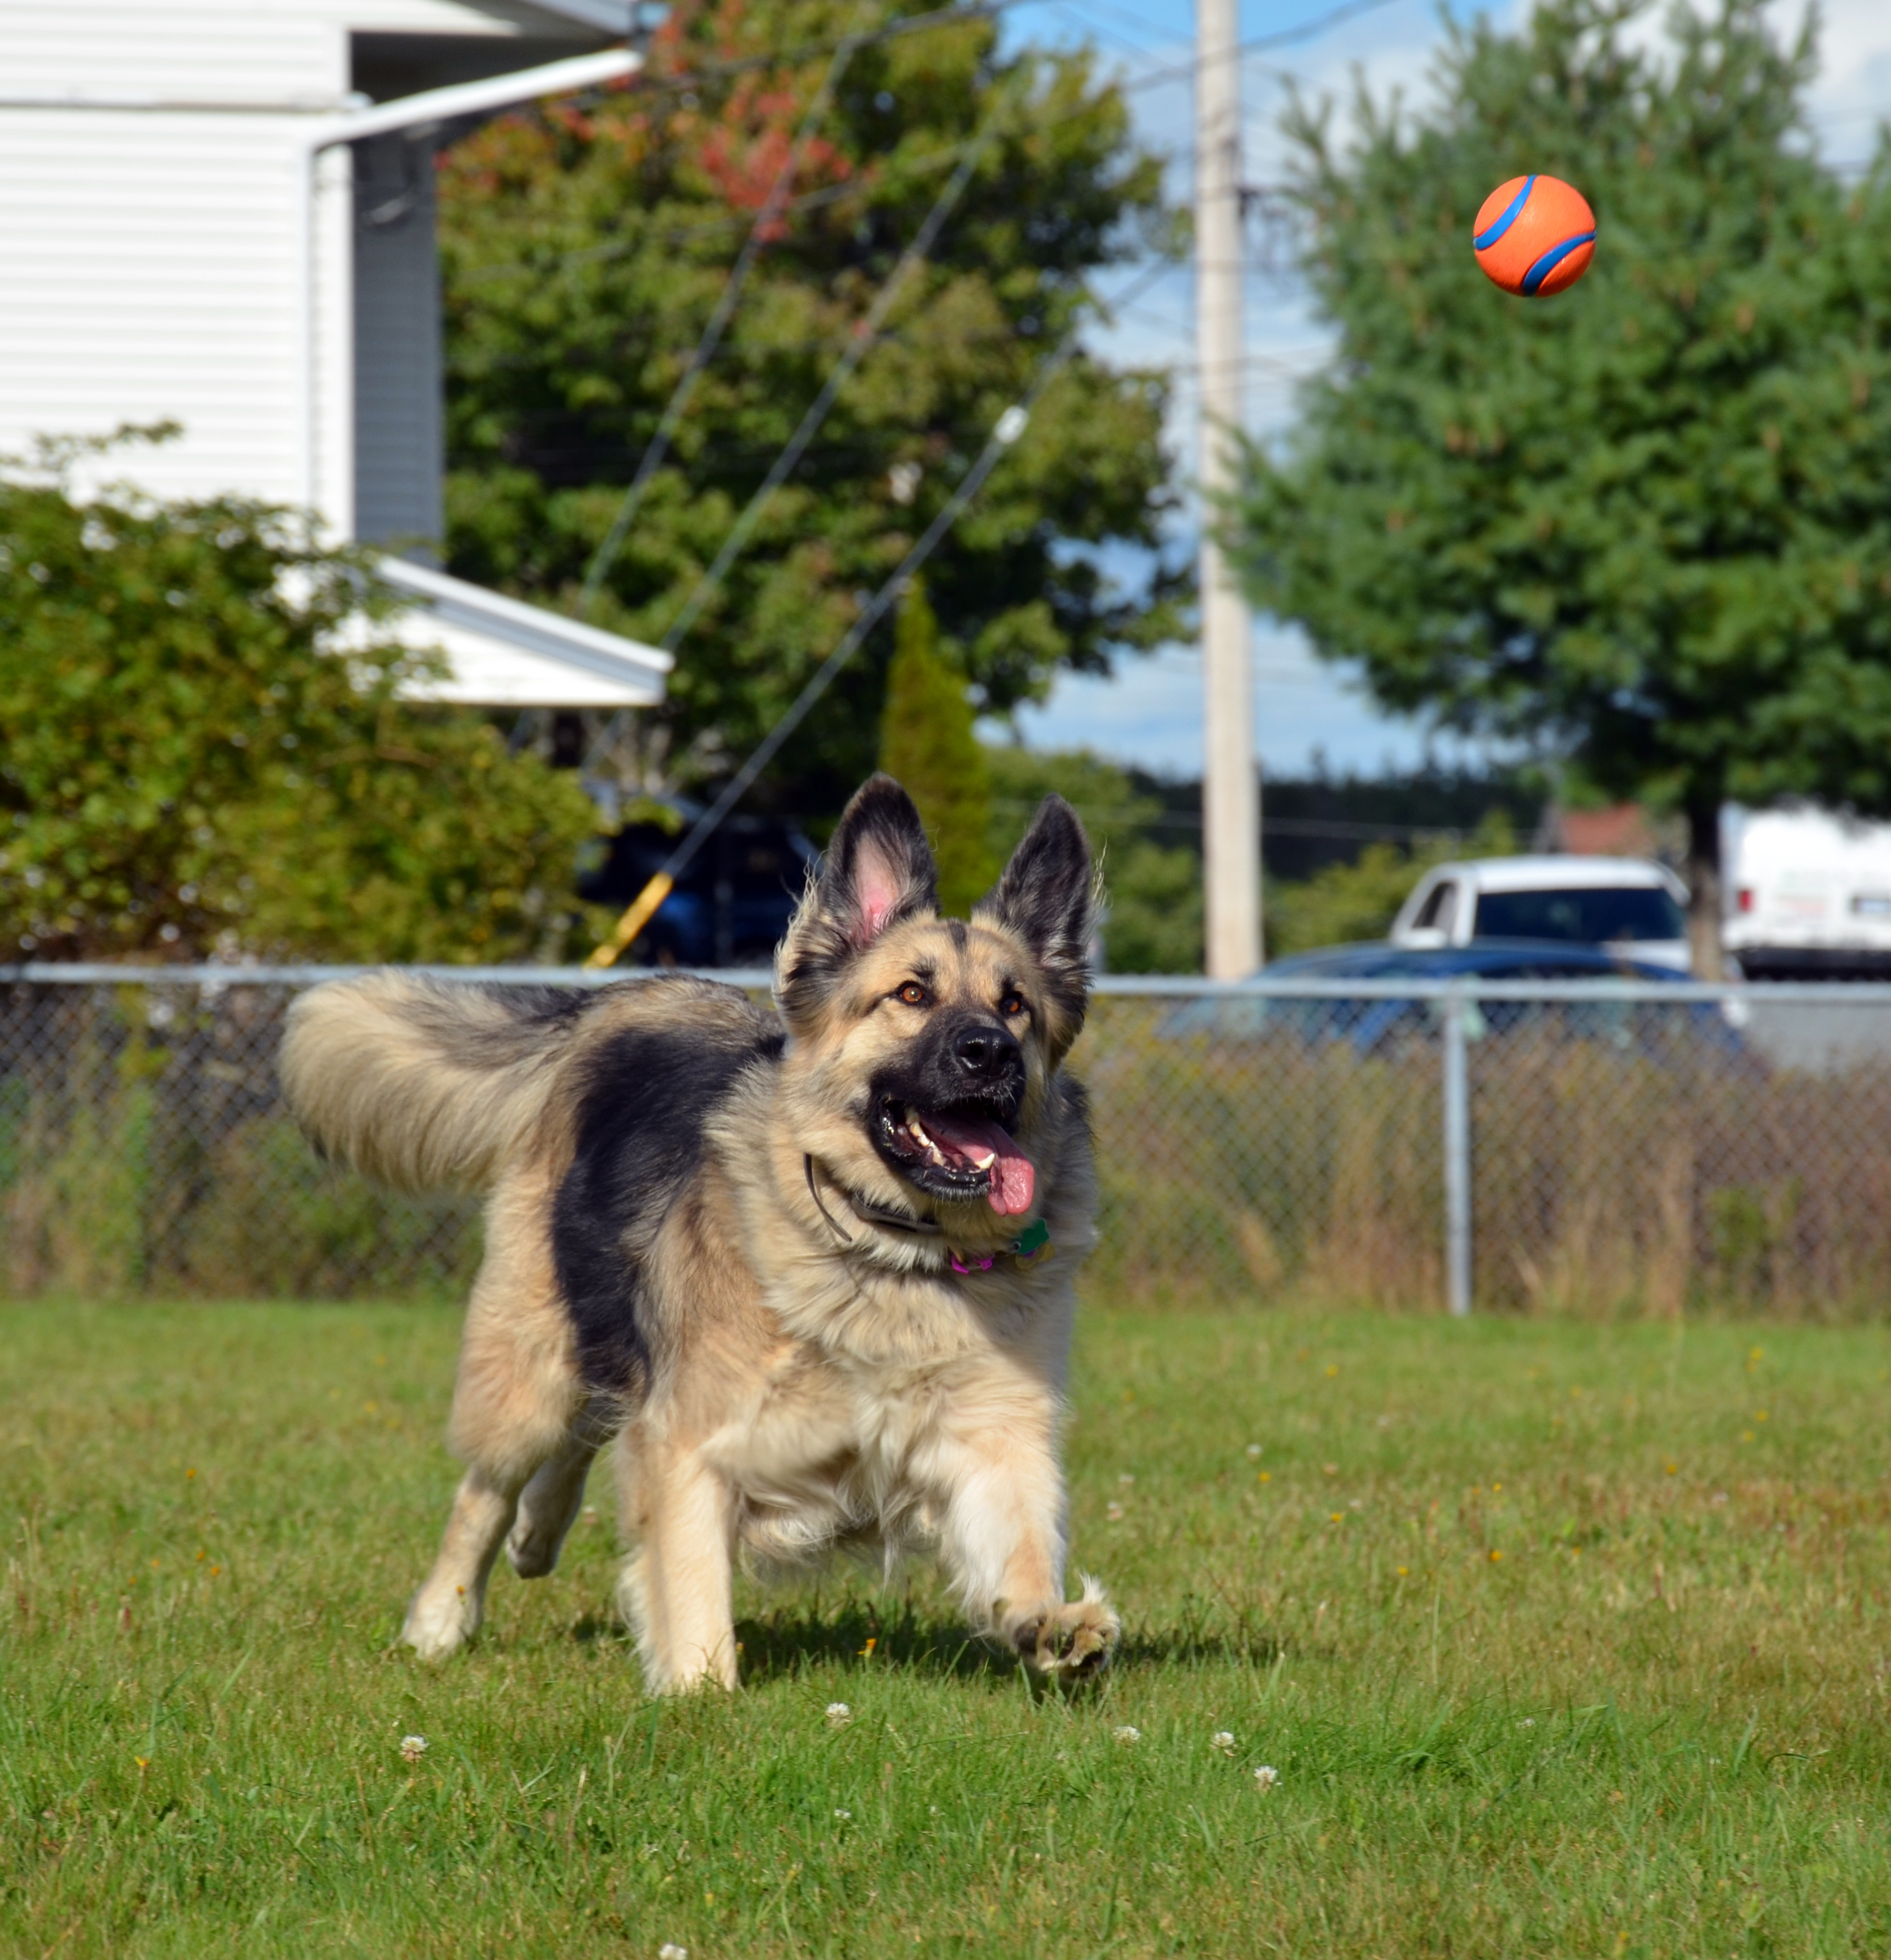 Why I Became a Dog Trainer